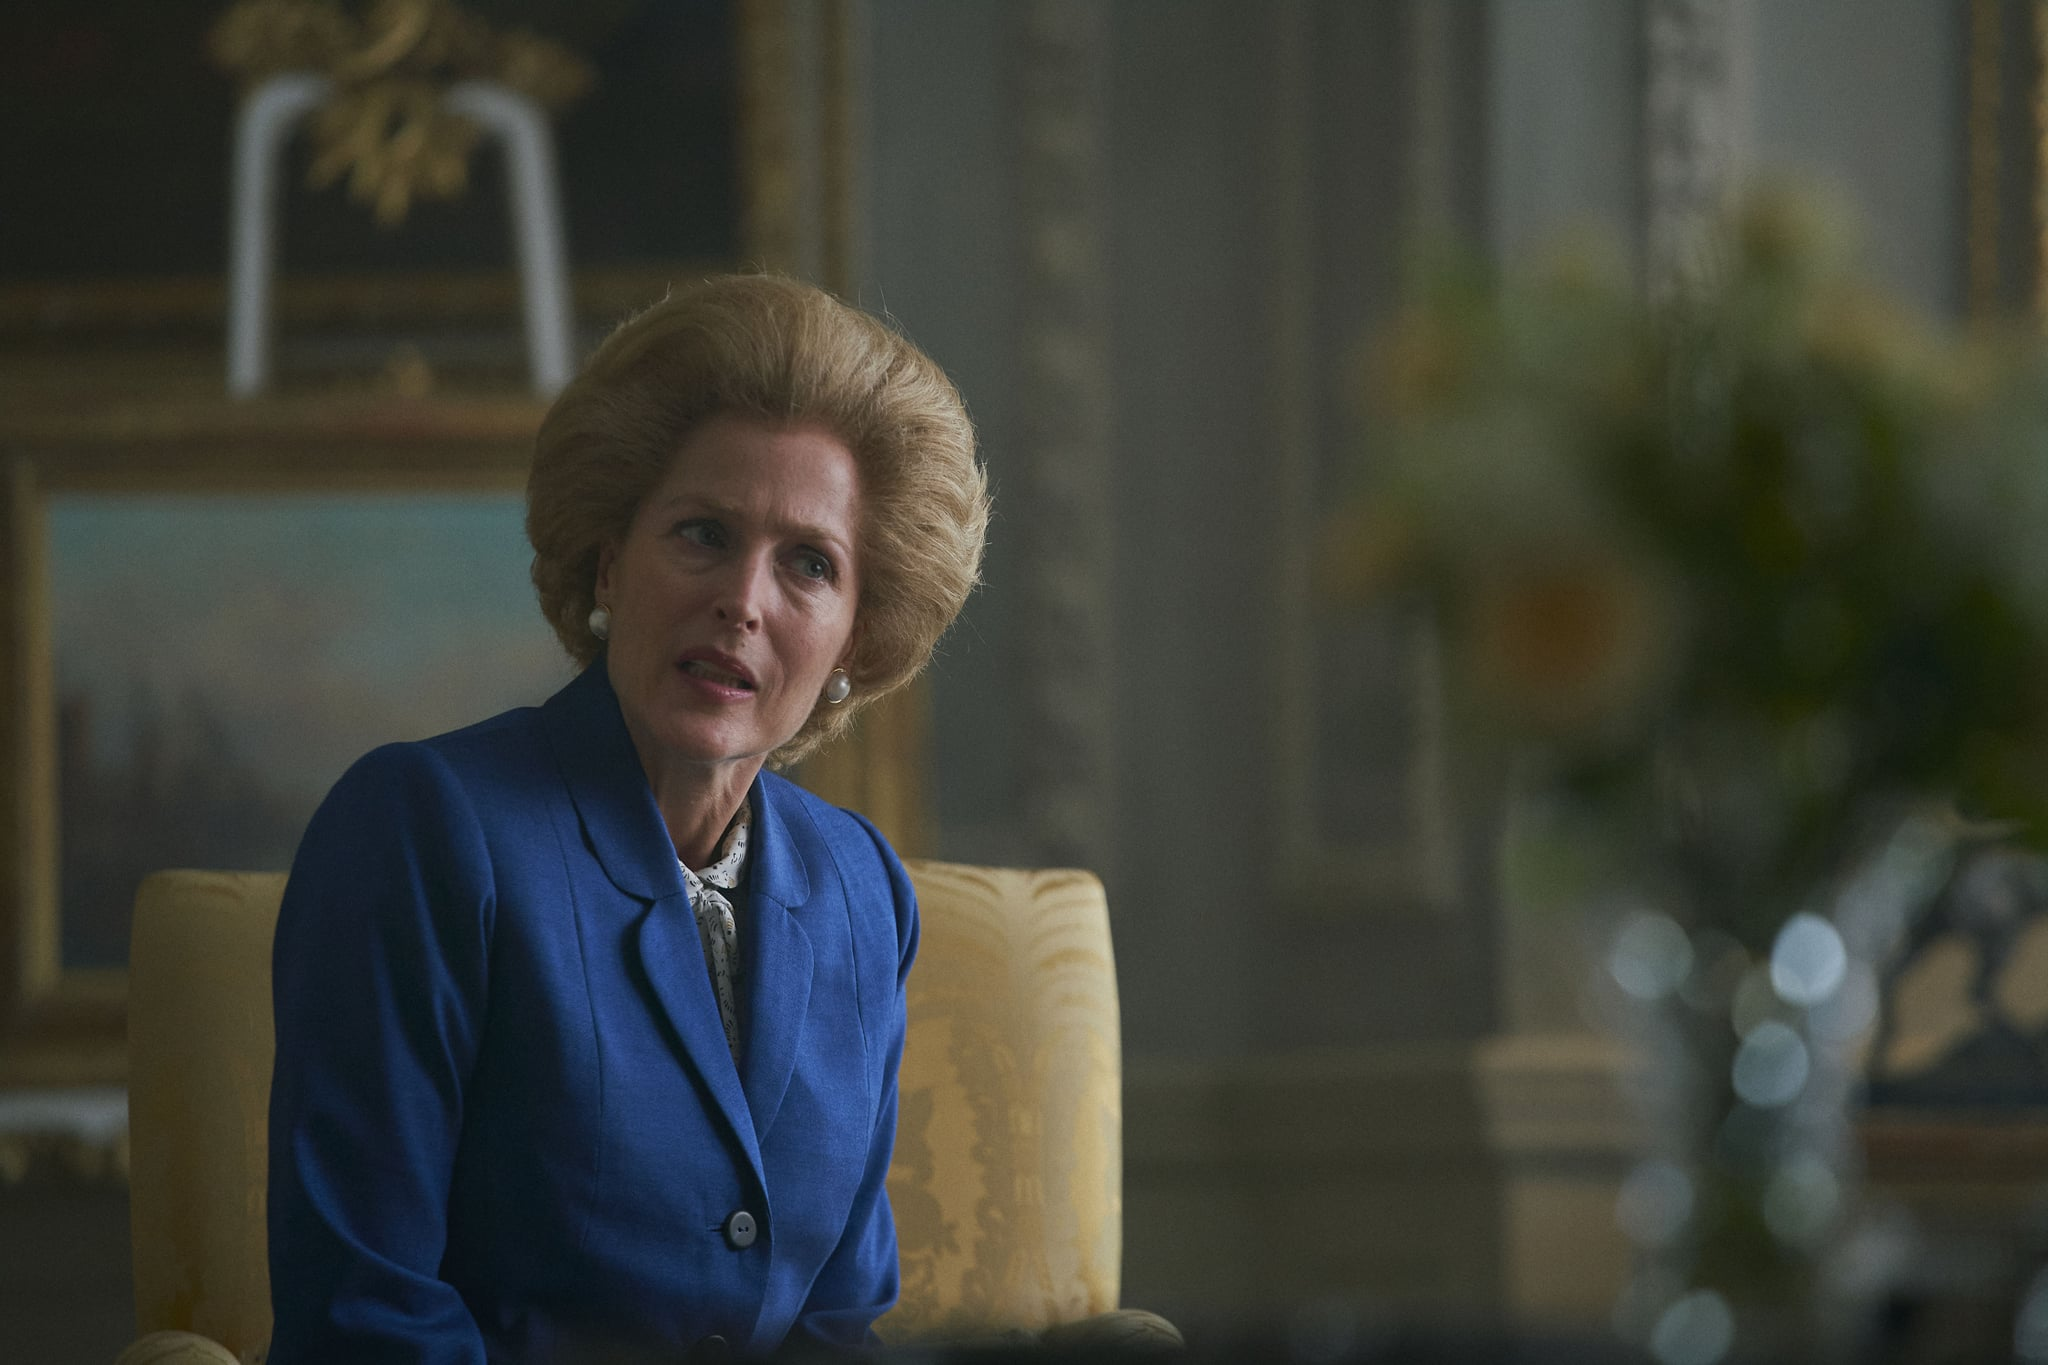 Margaret Thatcher Hairstyle Details On The Crown Season 4 Popsugar Beauty